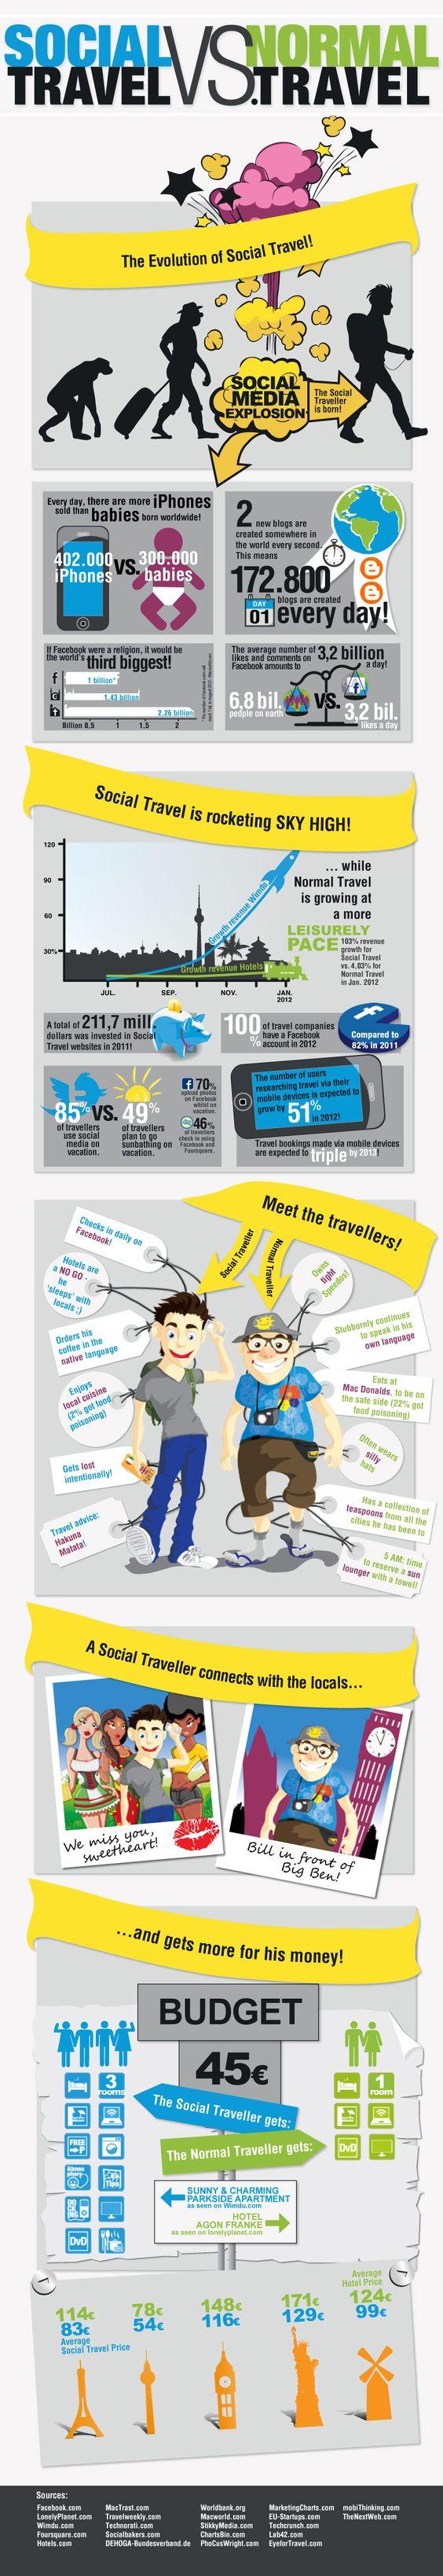 Social Travel vs. Normal Travel